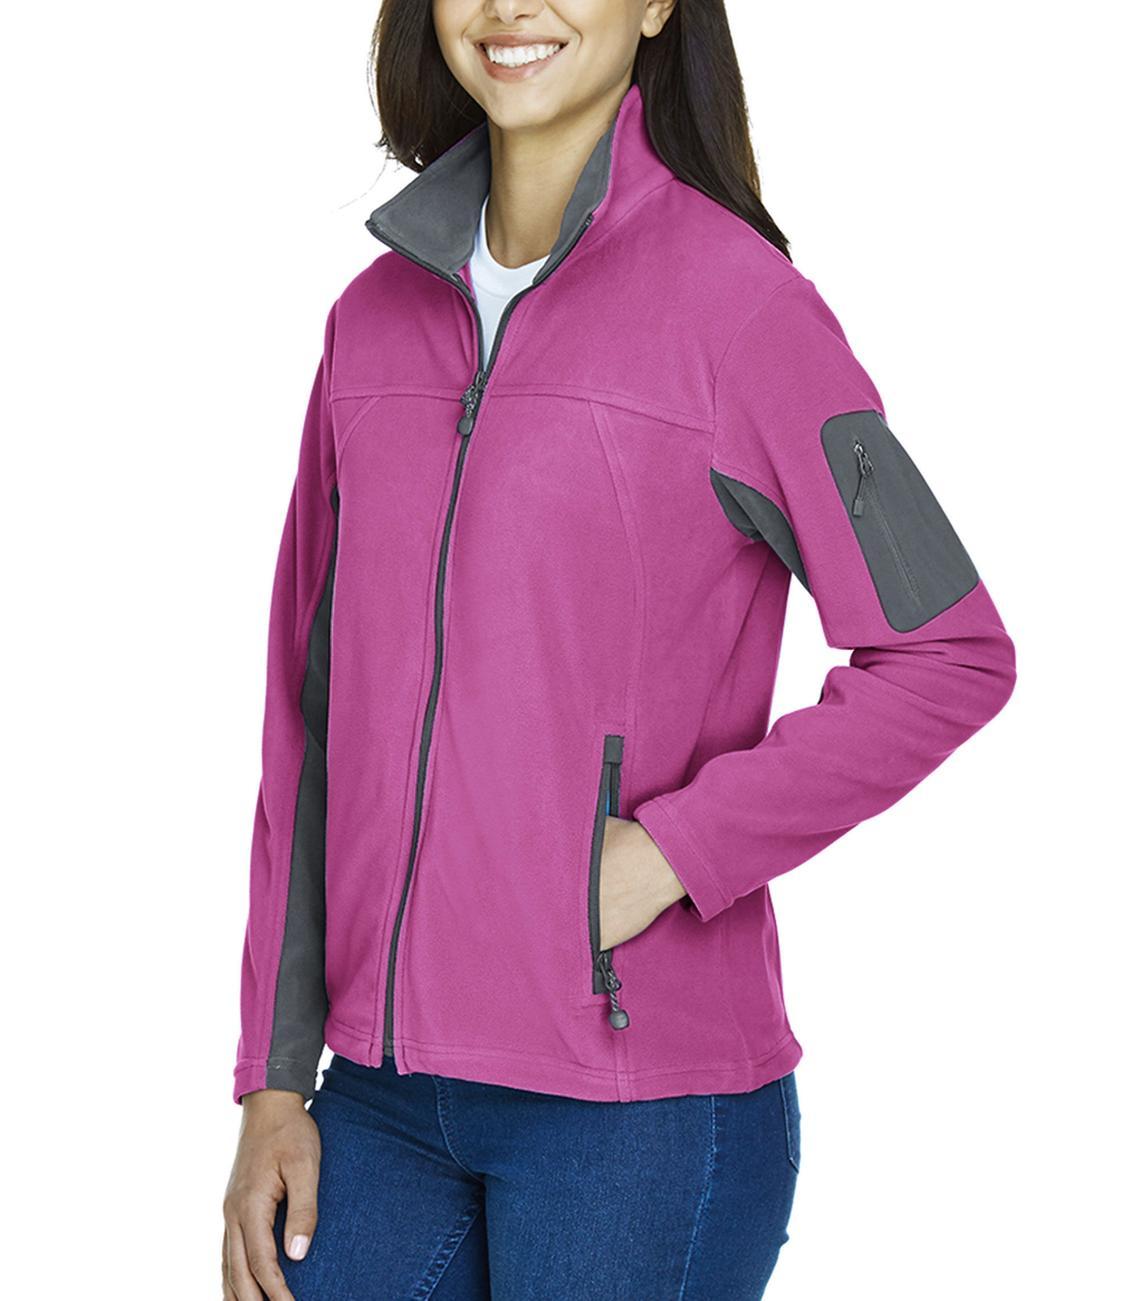 VAD-Wear®-Ladies-Micro-Fleece-LVAD-Jacket-2-3.jpg